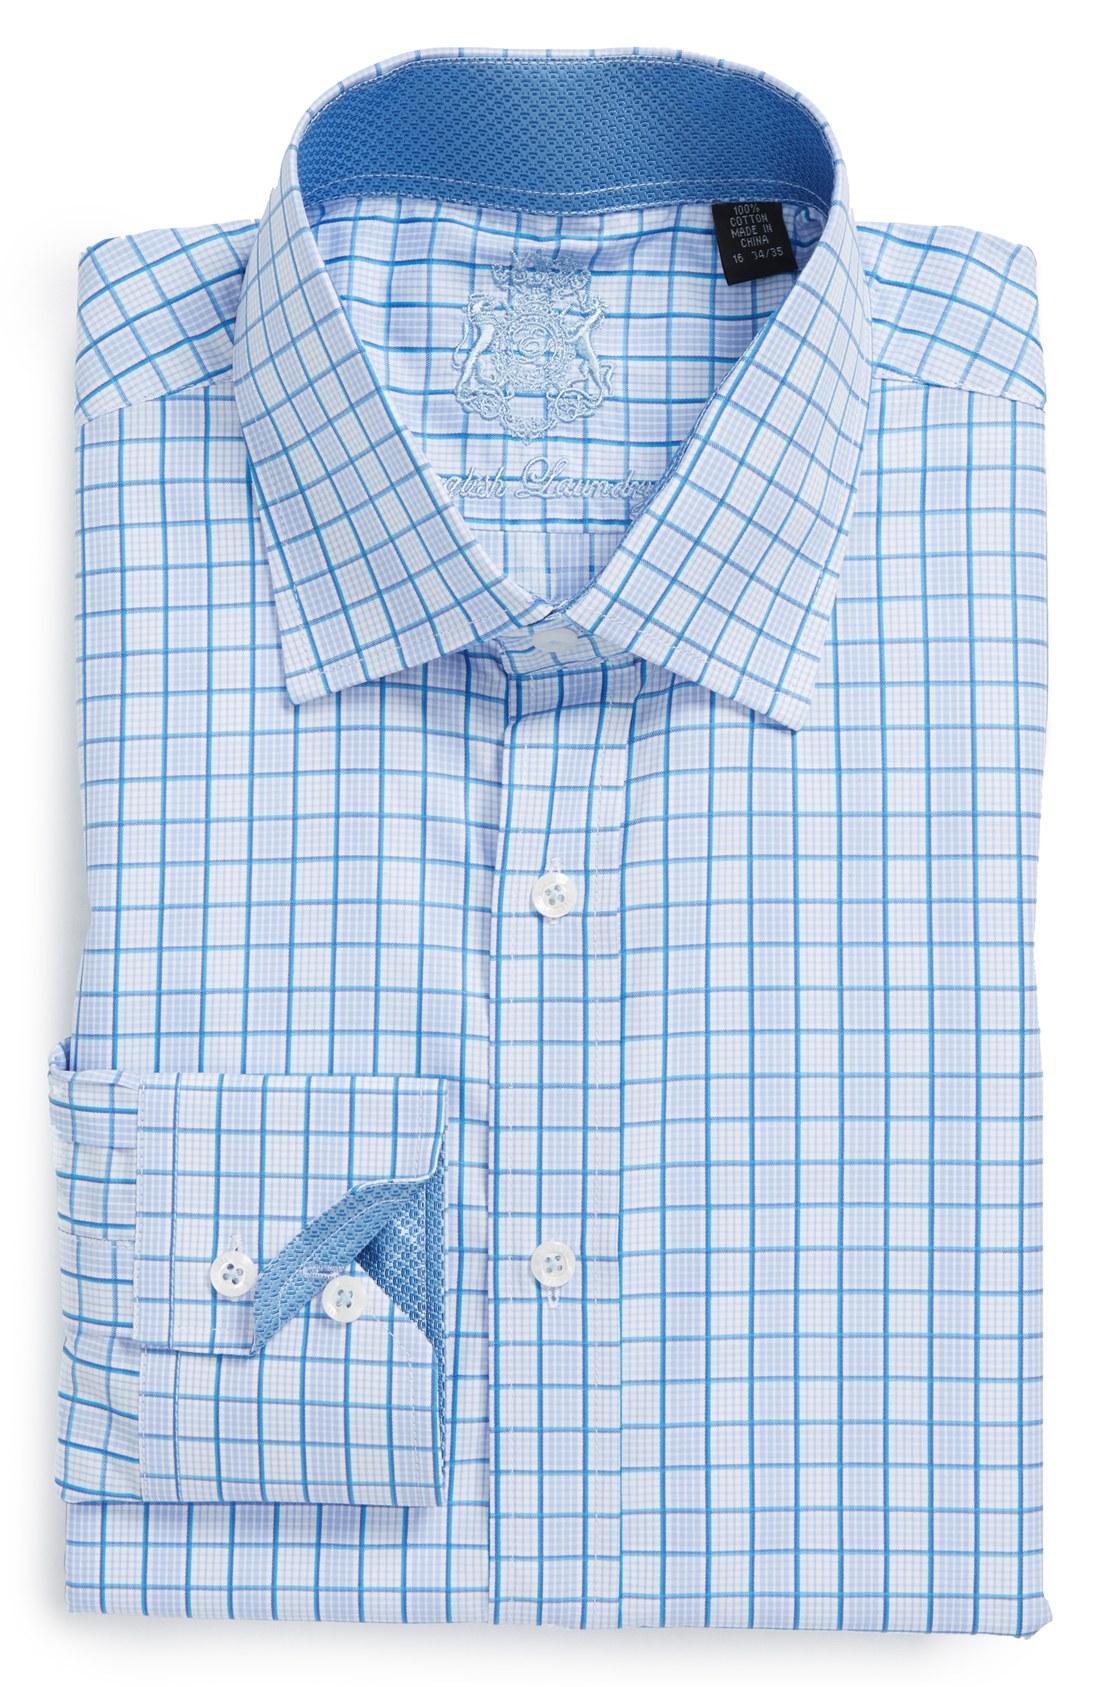 English laundry english laundry trim fit check dress shirt for 17 33 shirt size